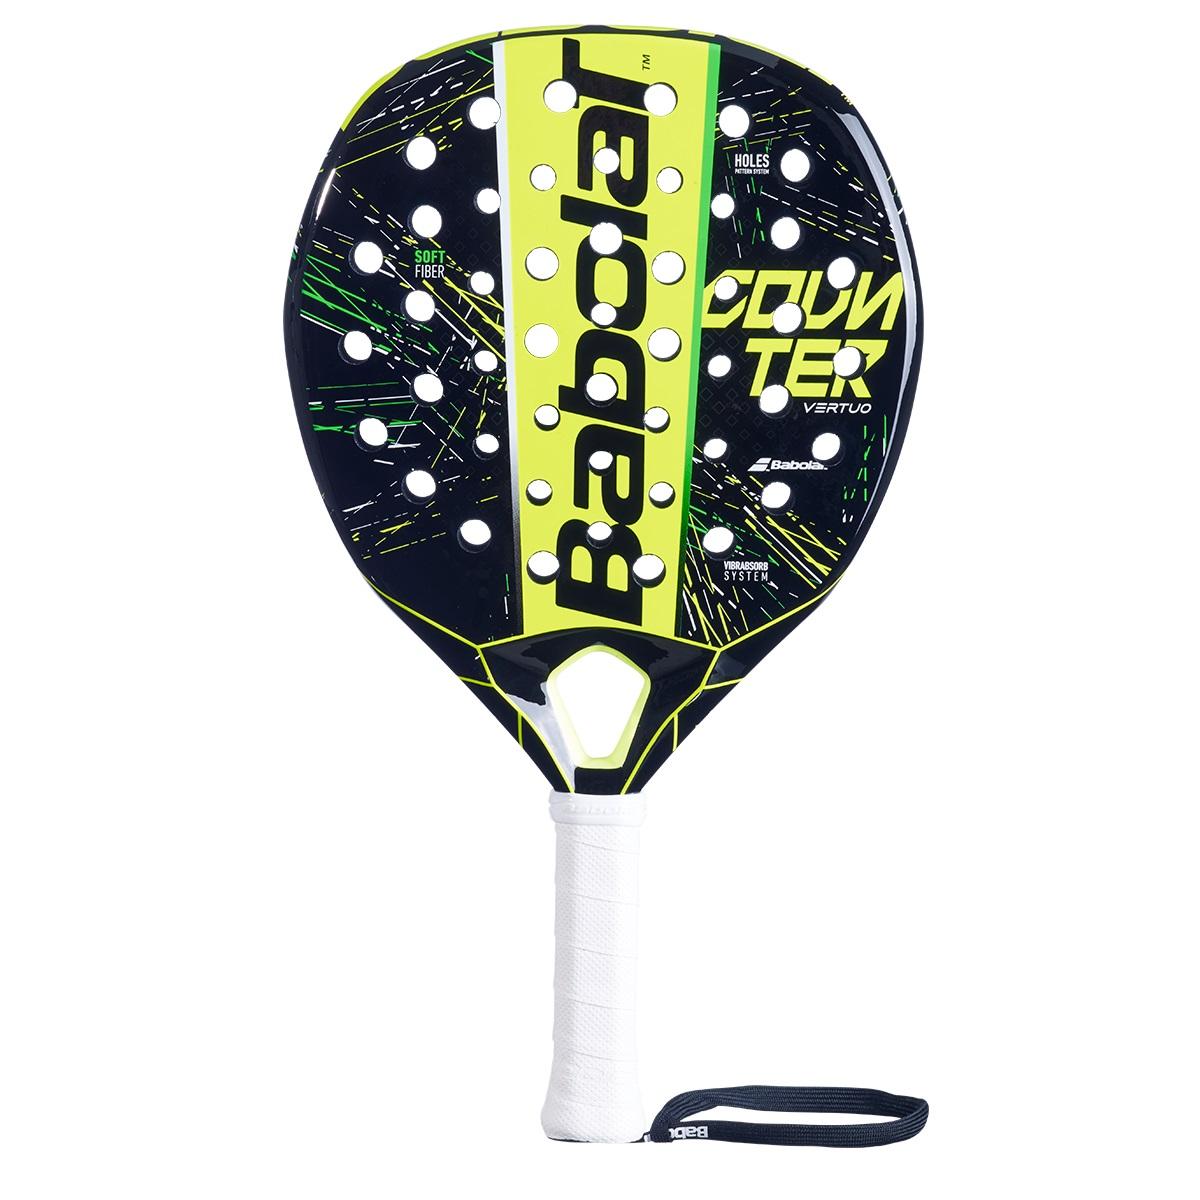 Babolat Counter Vertuo sr. Padel racket